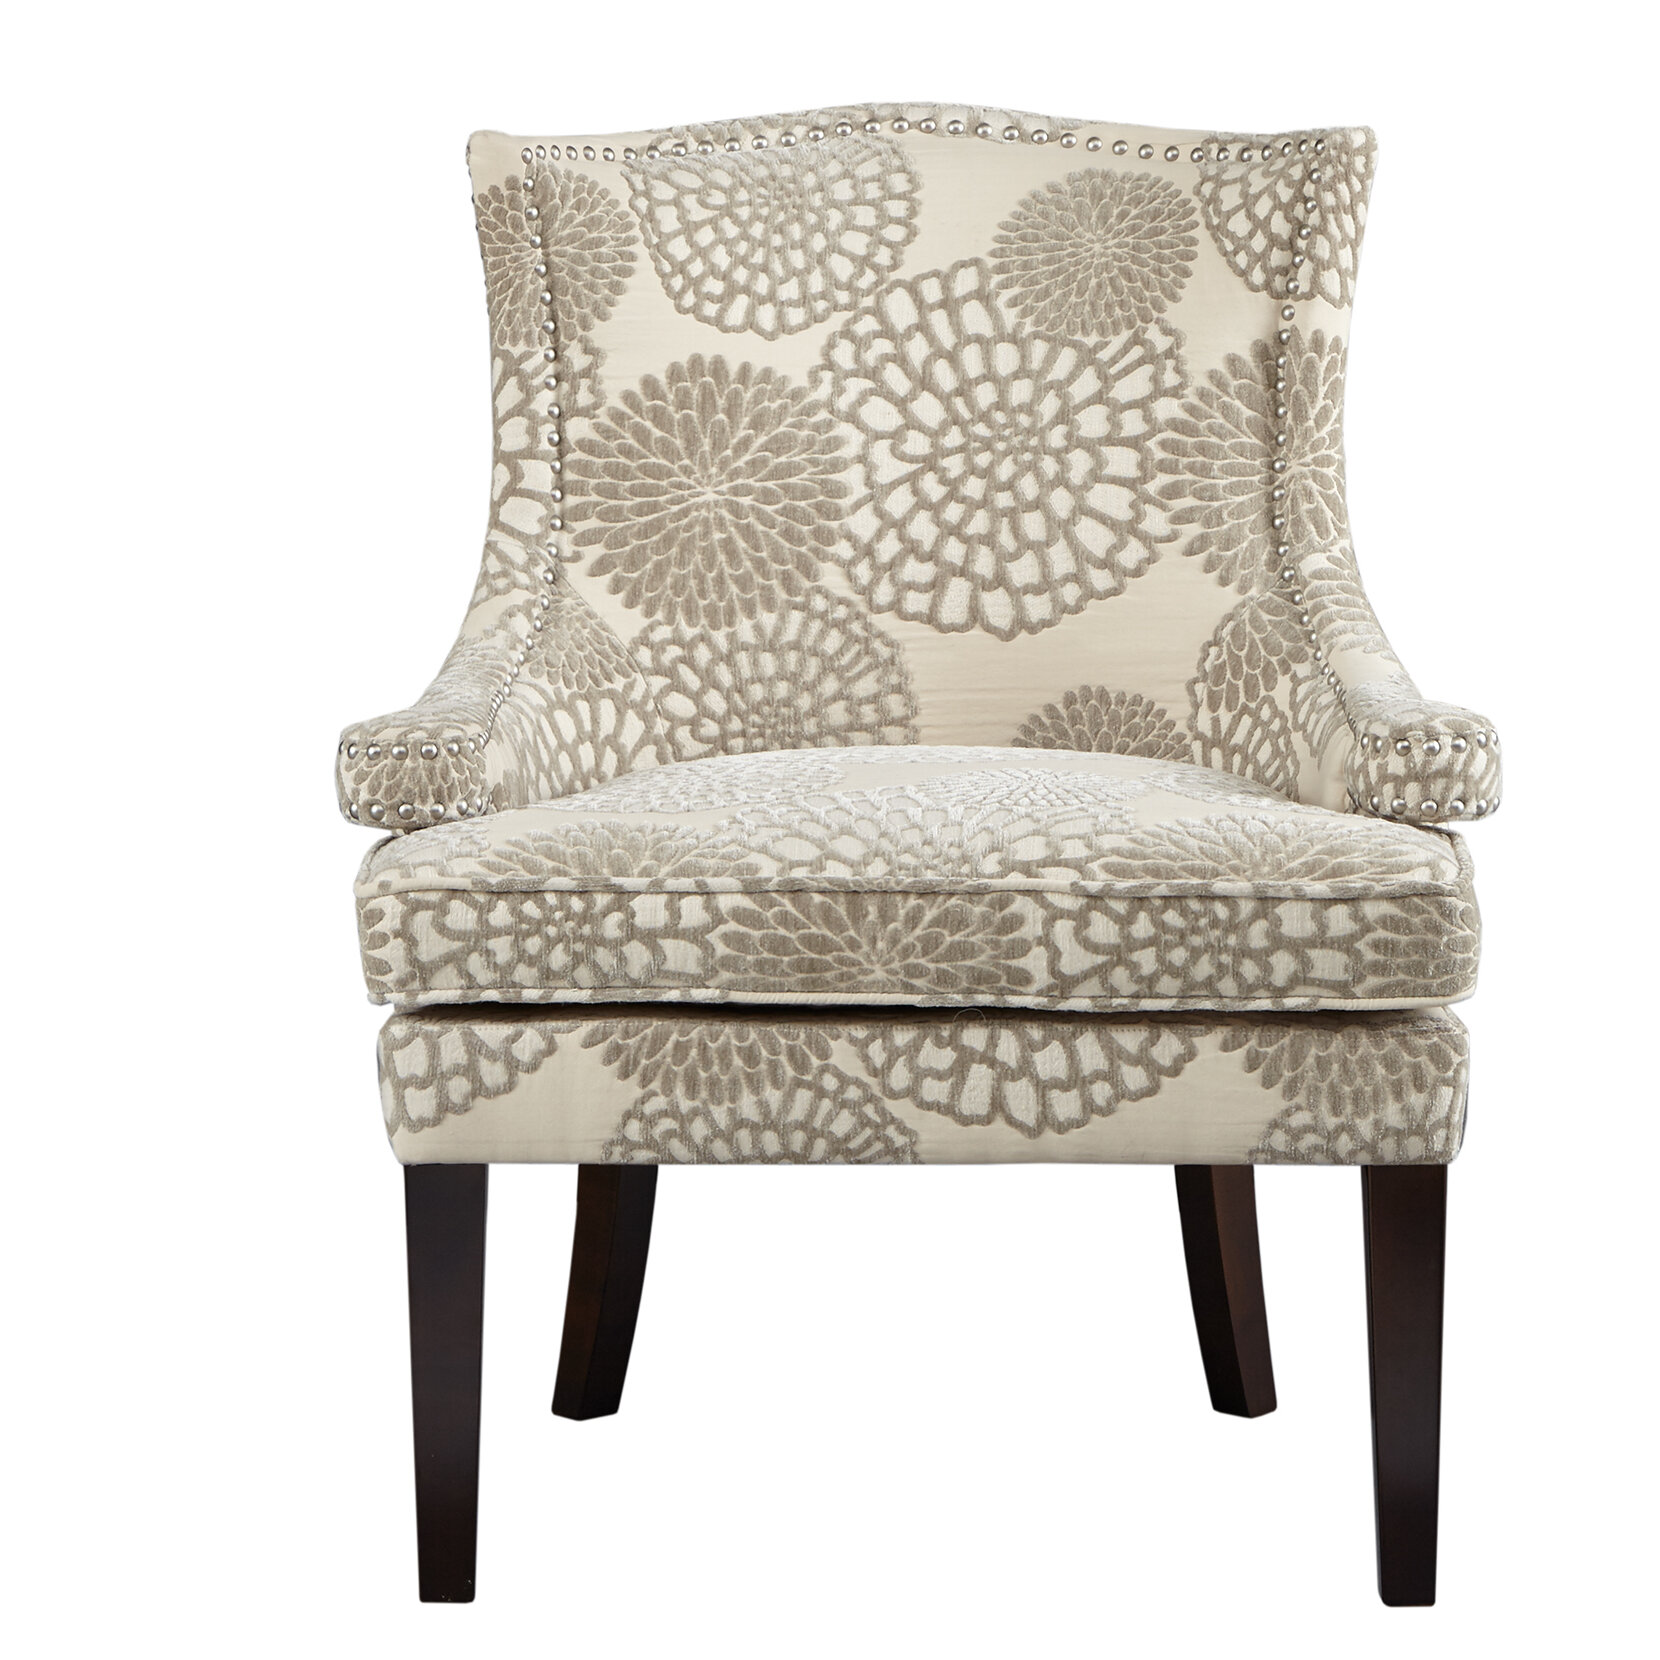 Madison Park Signature Floral Wingback Chair U0026 Reviews | Wayfair